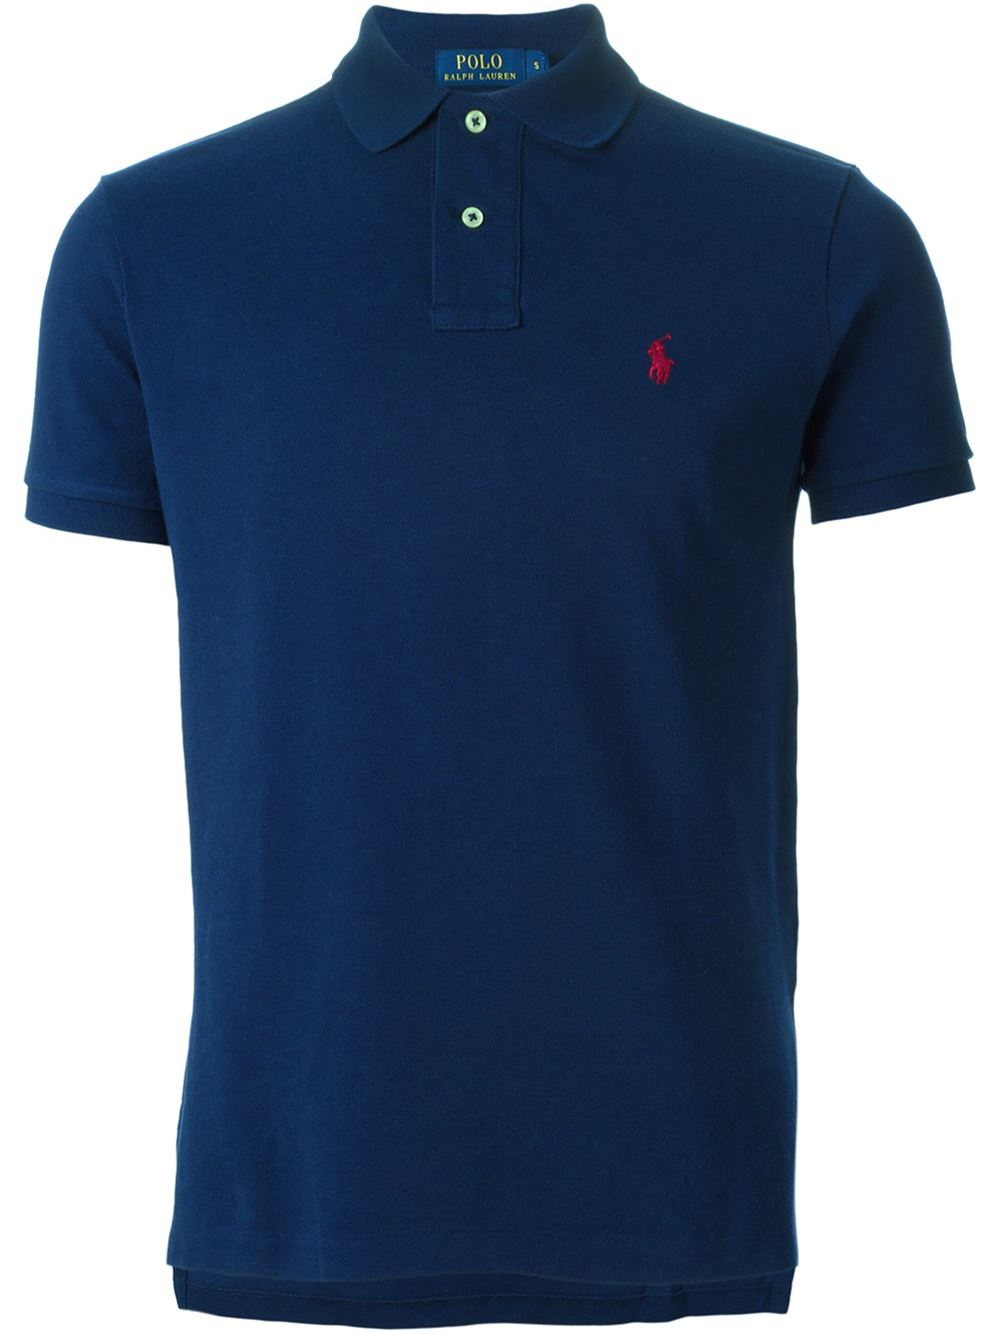 Polo ralph lauren embroidered logo polo shirt in blue for for Ralph lauren logo shirt